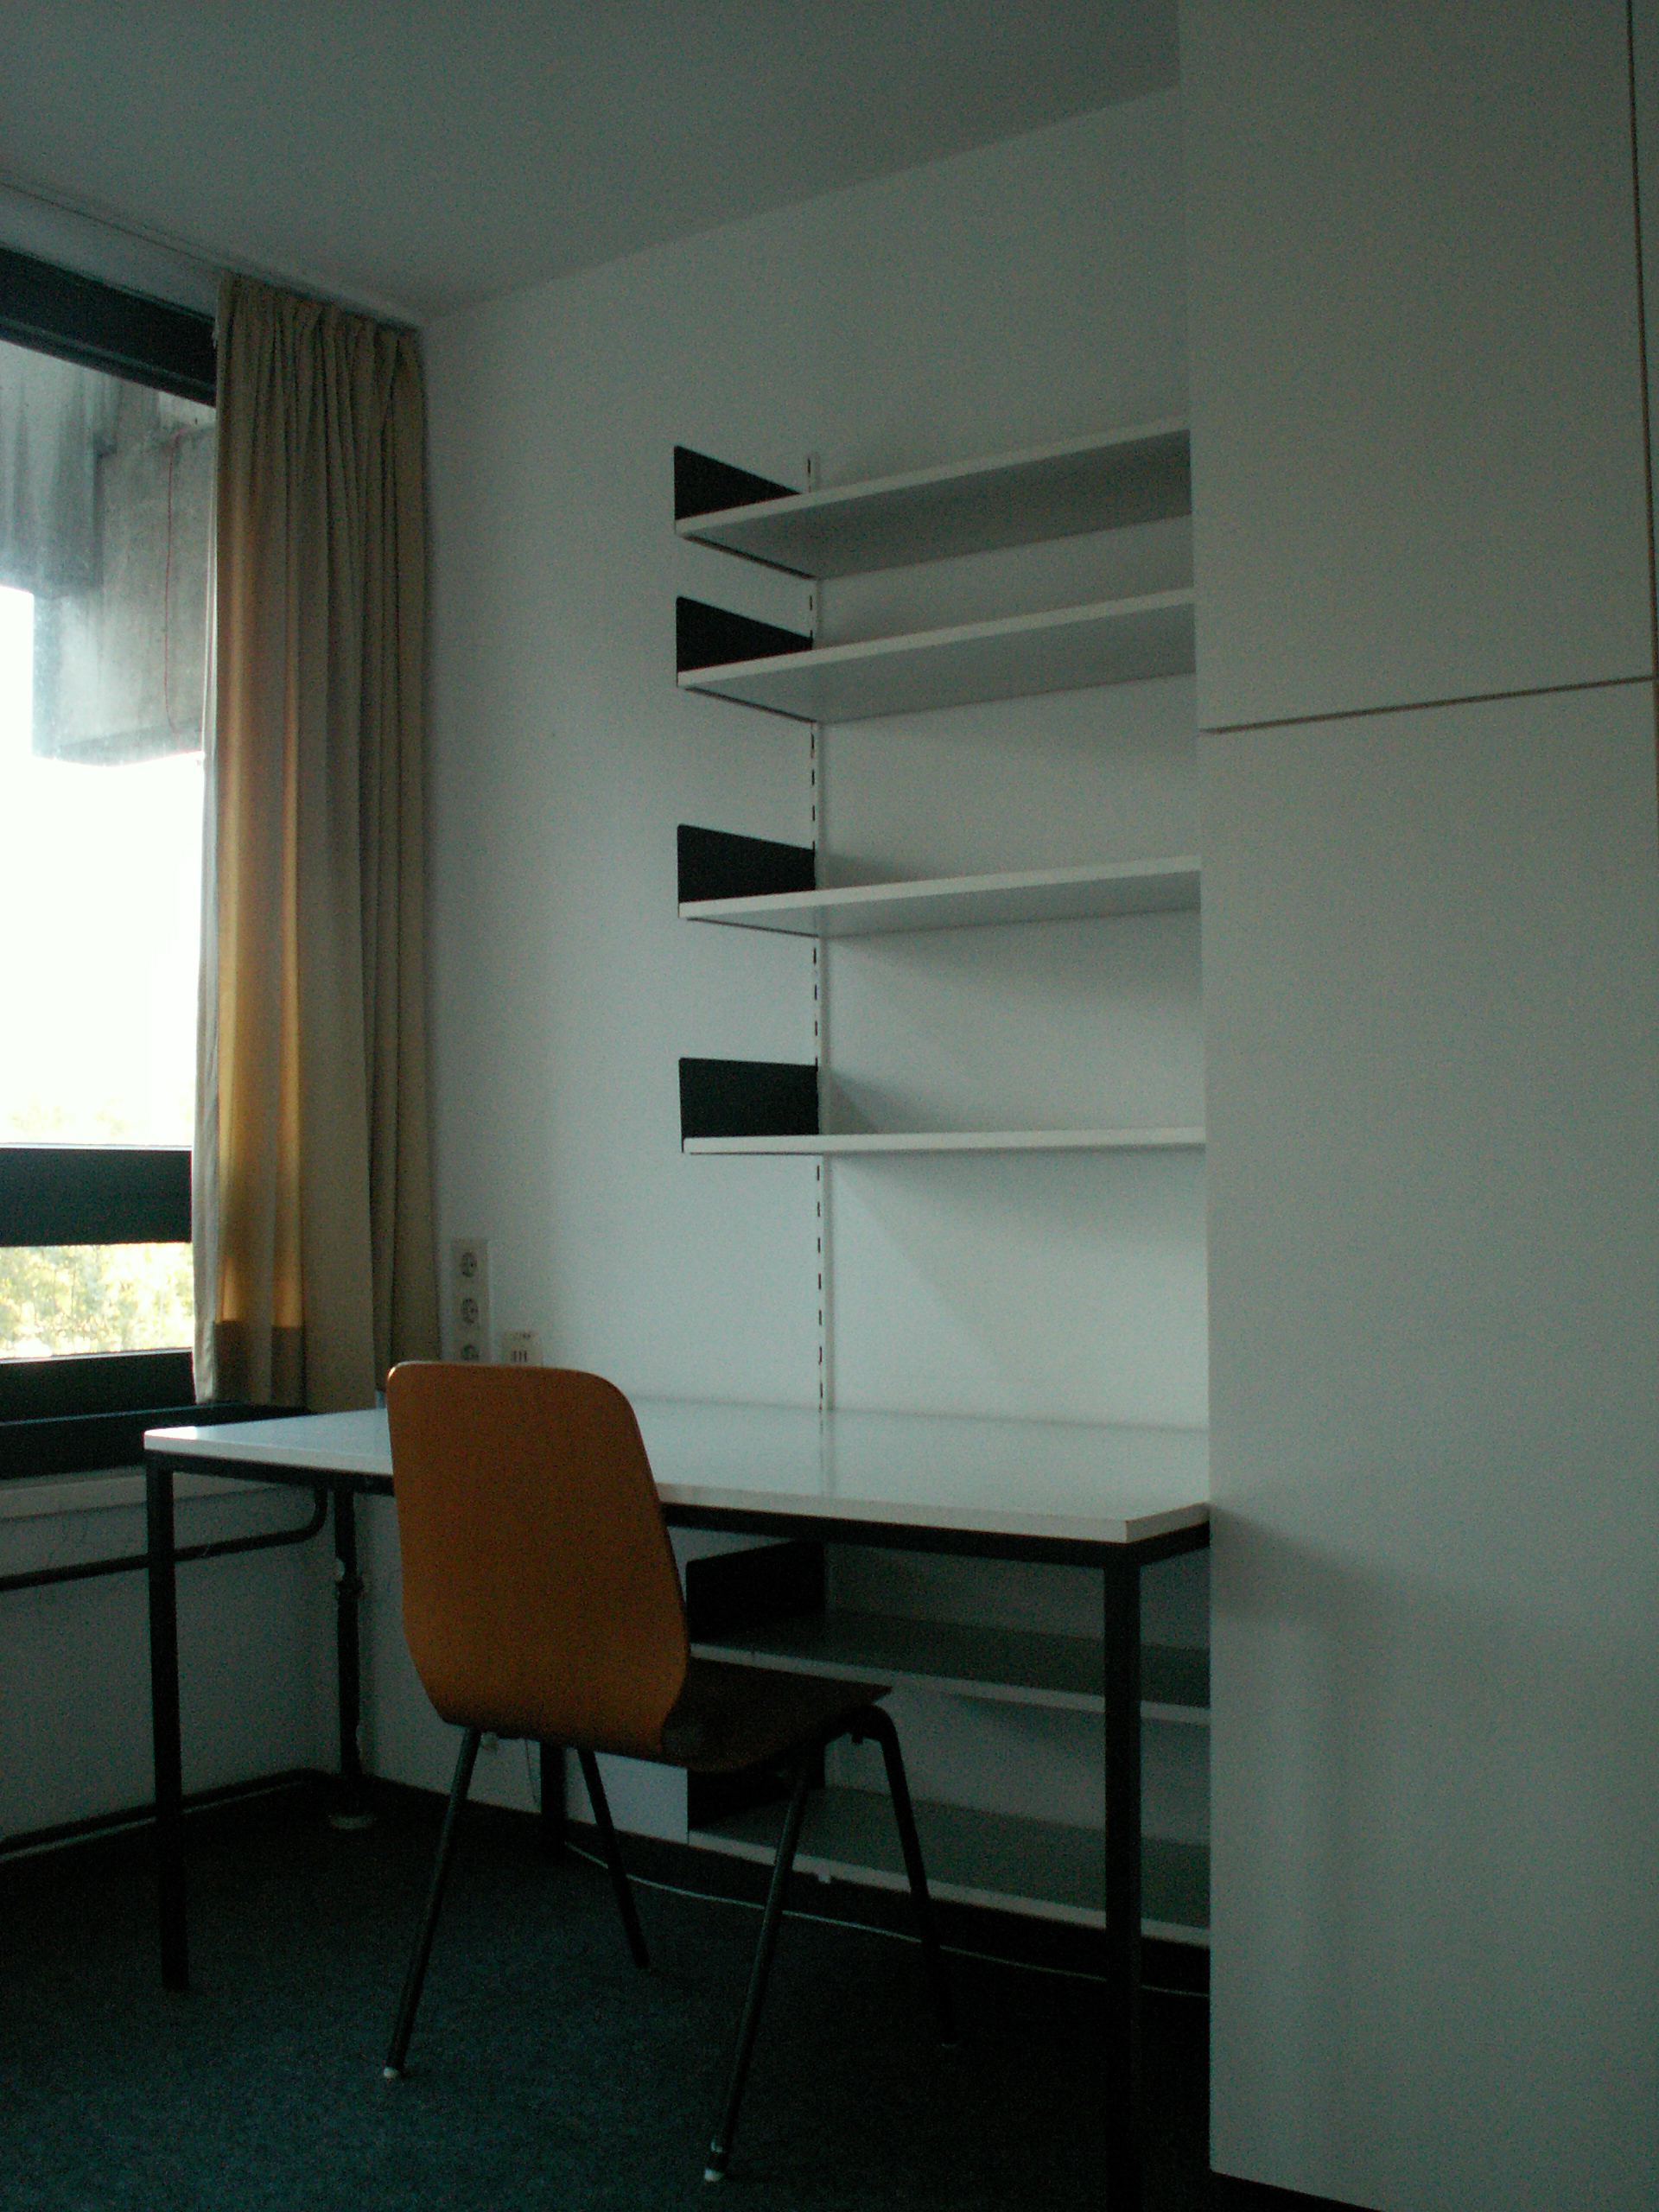 File:Zimmer im HSH.JPG - Wikimedia Commons